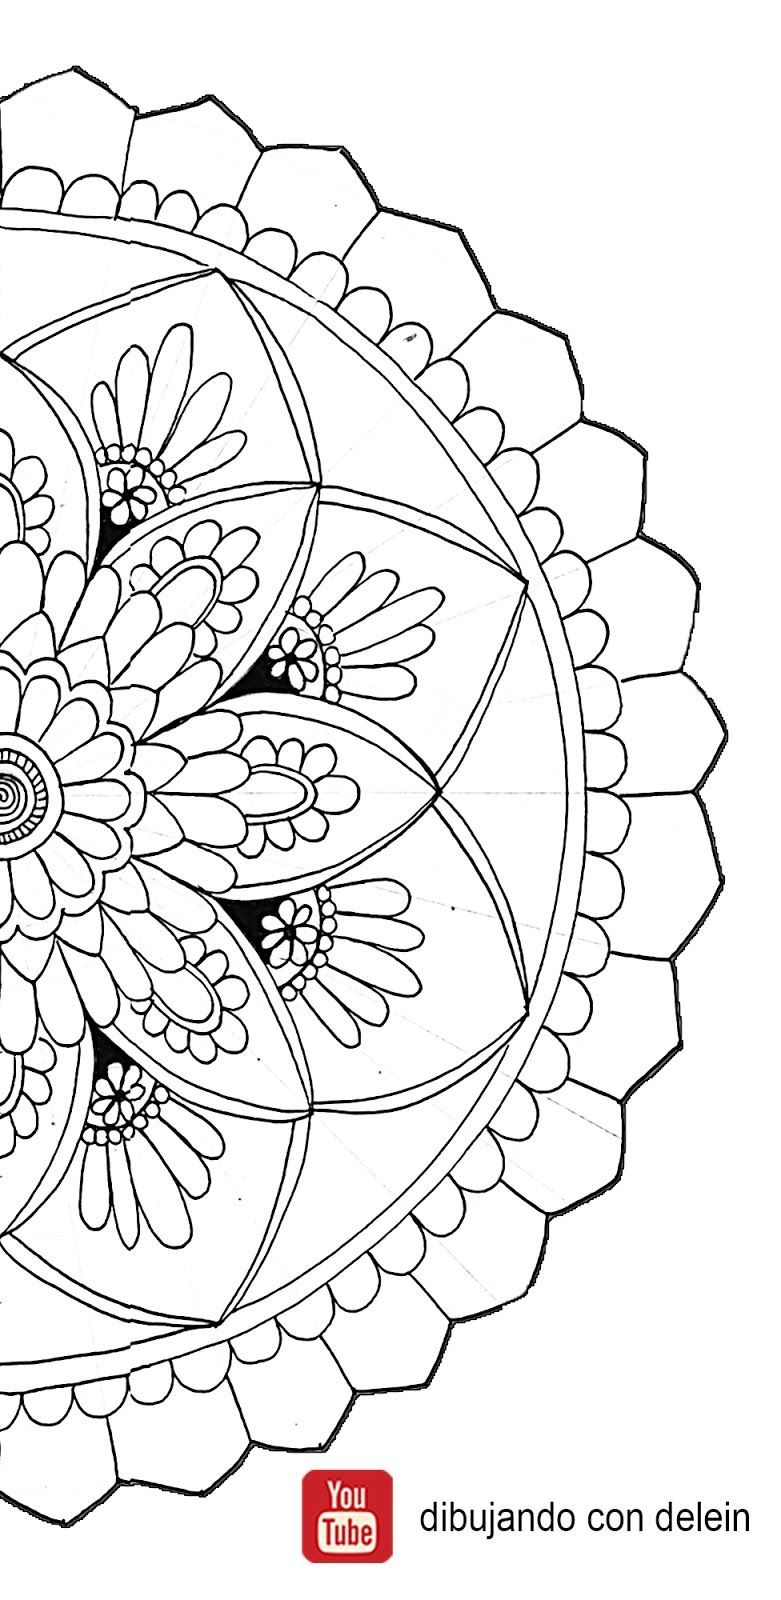 Como Dibujar Un Mandala Paso A Paso Como Dibujar Un Mandala Paso A Paso In 2020 Mandala Design Art Mandala Drawing Mandala Art